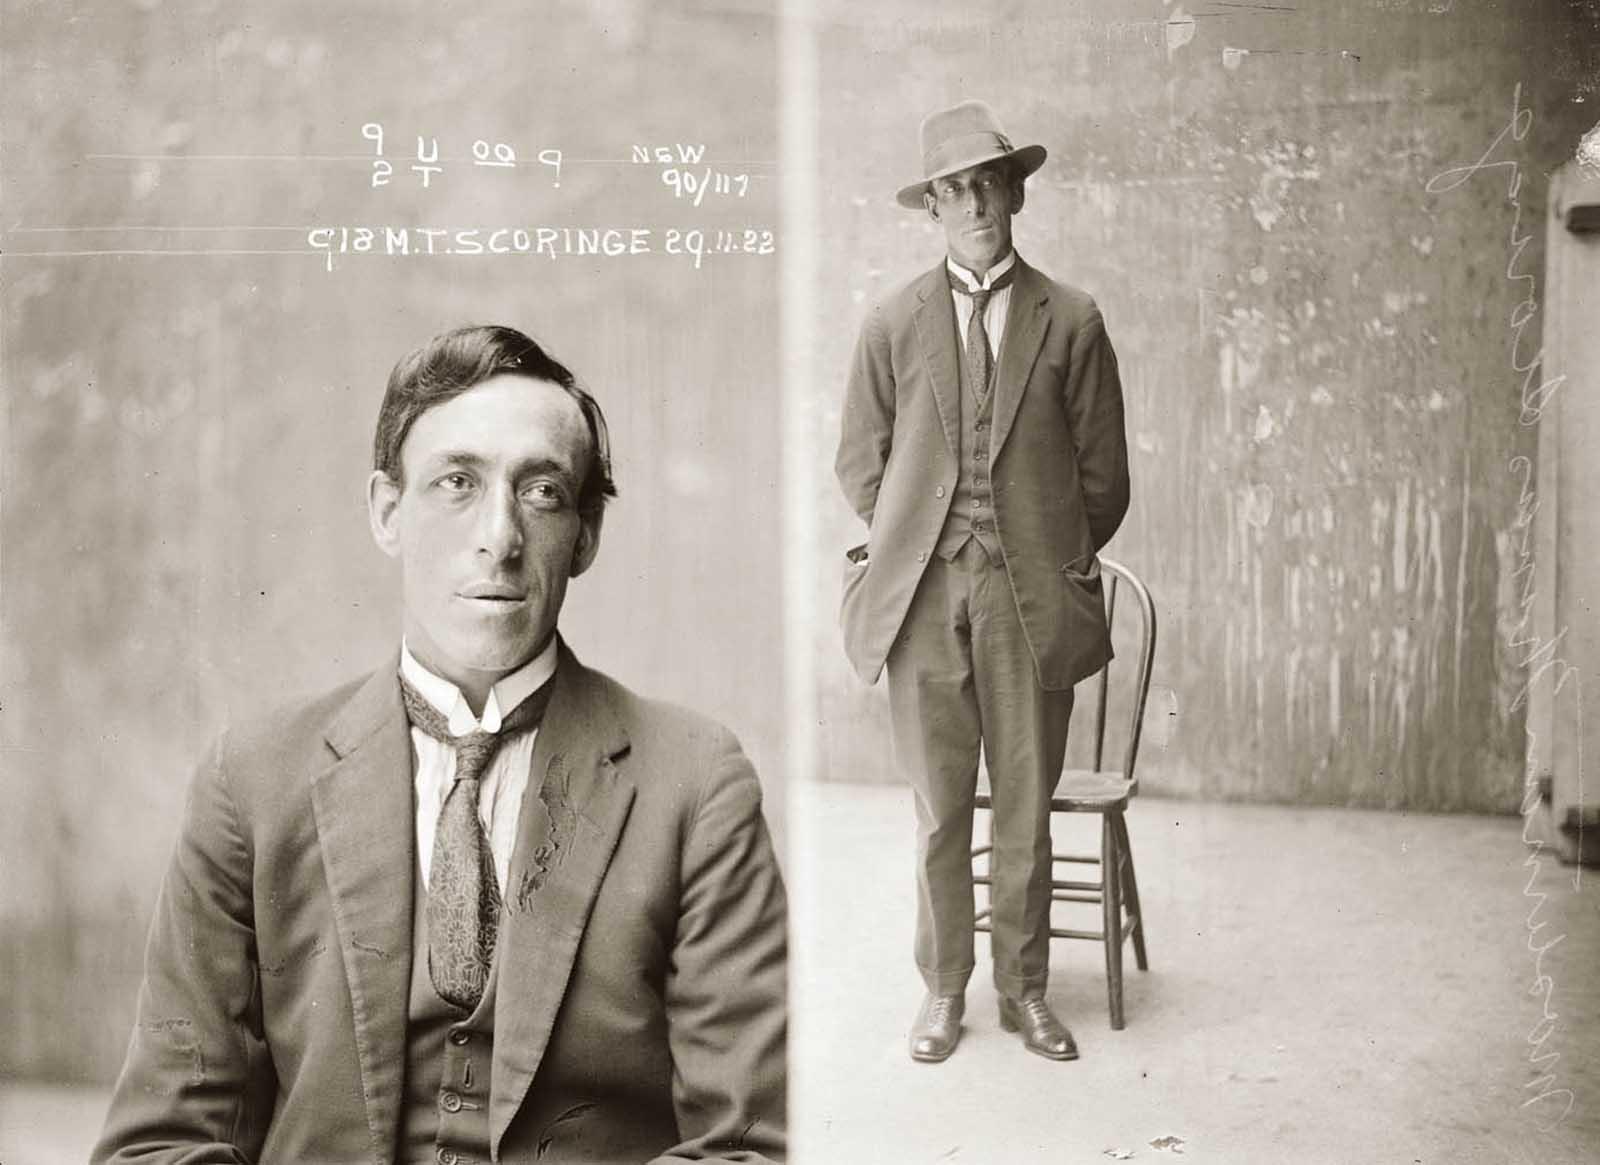 Masterman Thomas Scoringe. 1922.